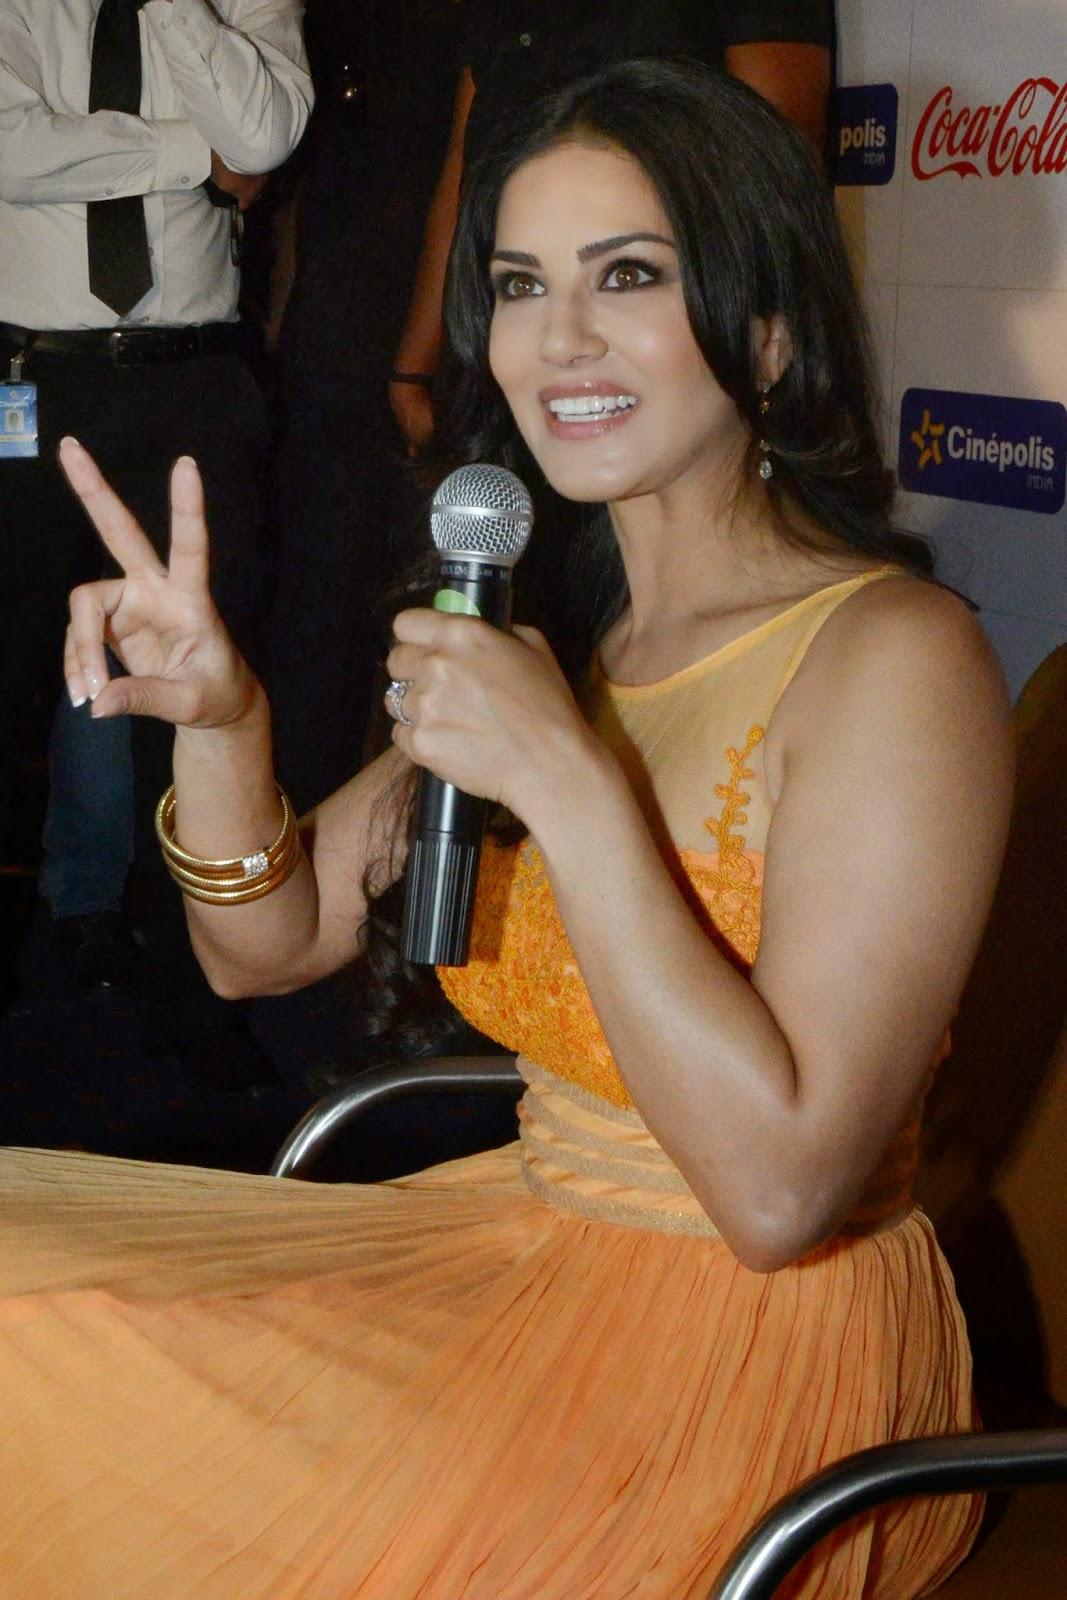 Bhushan Patel, Bollywood, Daniel Weber, Entertainment, Hindi Film, Horror Movie, Ragini MMS, Ragini MMS 2, Release, Saahil Prem, Sandhya Mridul, Sequel, Showbiz, Sunny Leone, Sunny Leone Husband, Thriller Movie,